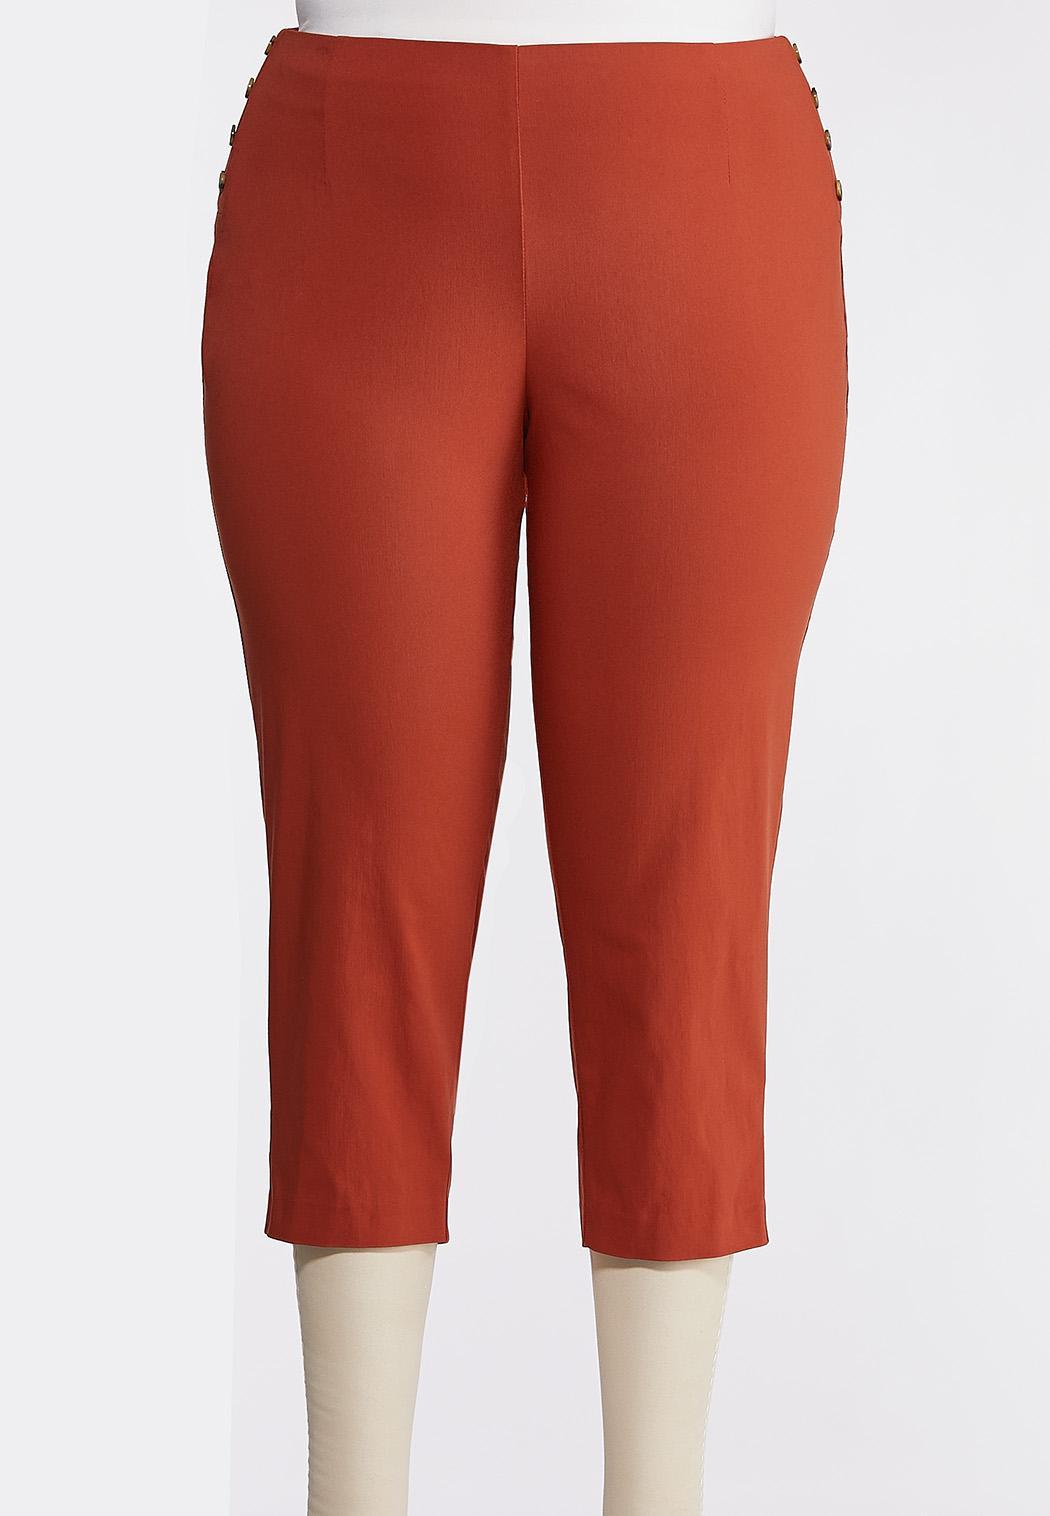 Plus Size Cropped Tortoise Button Pants